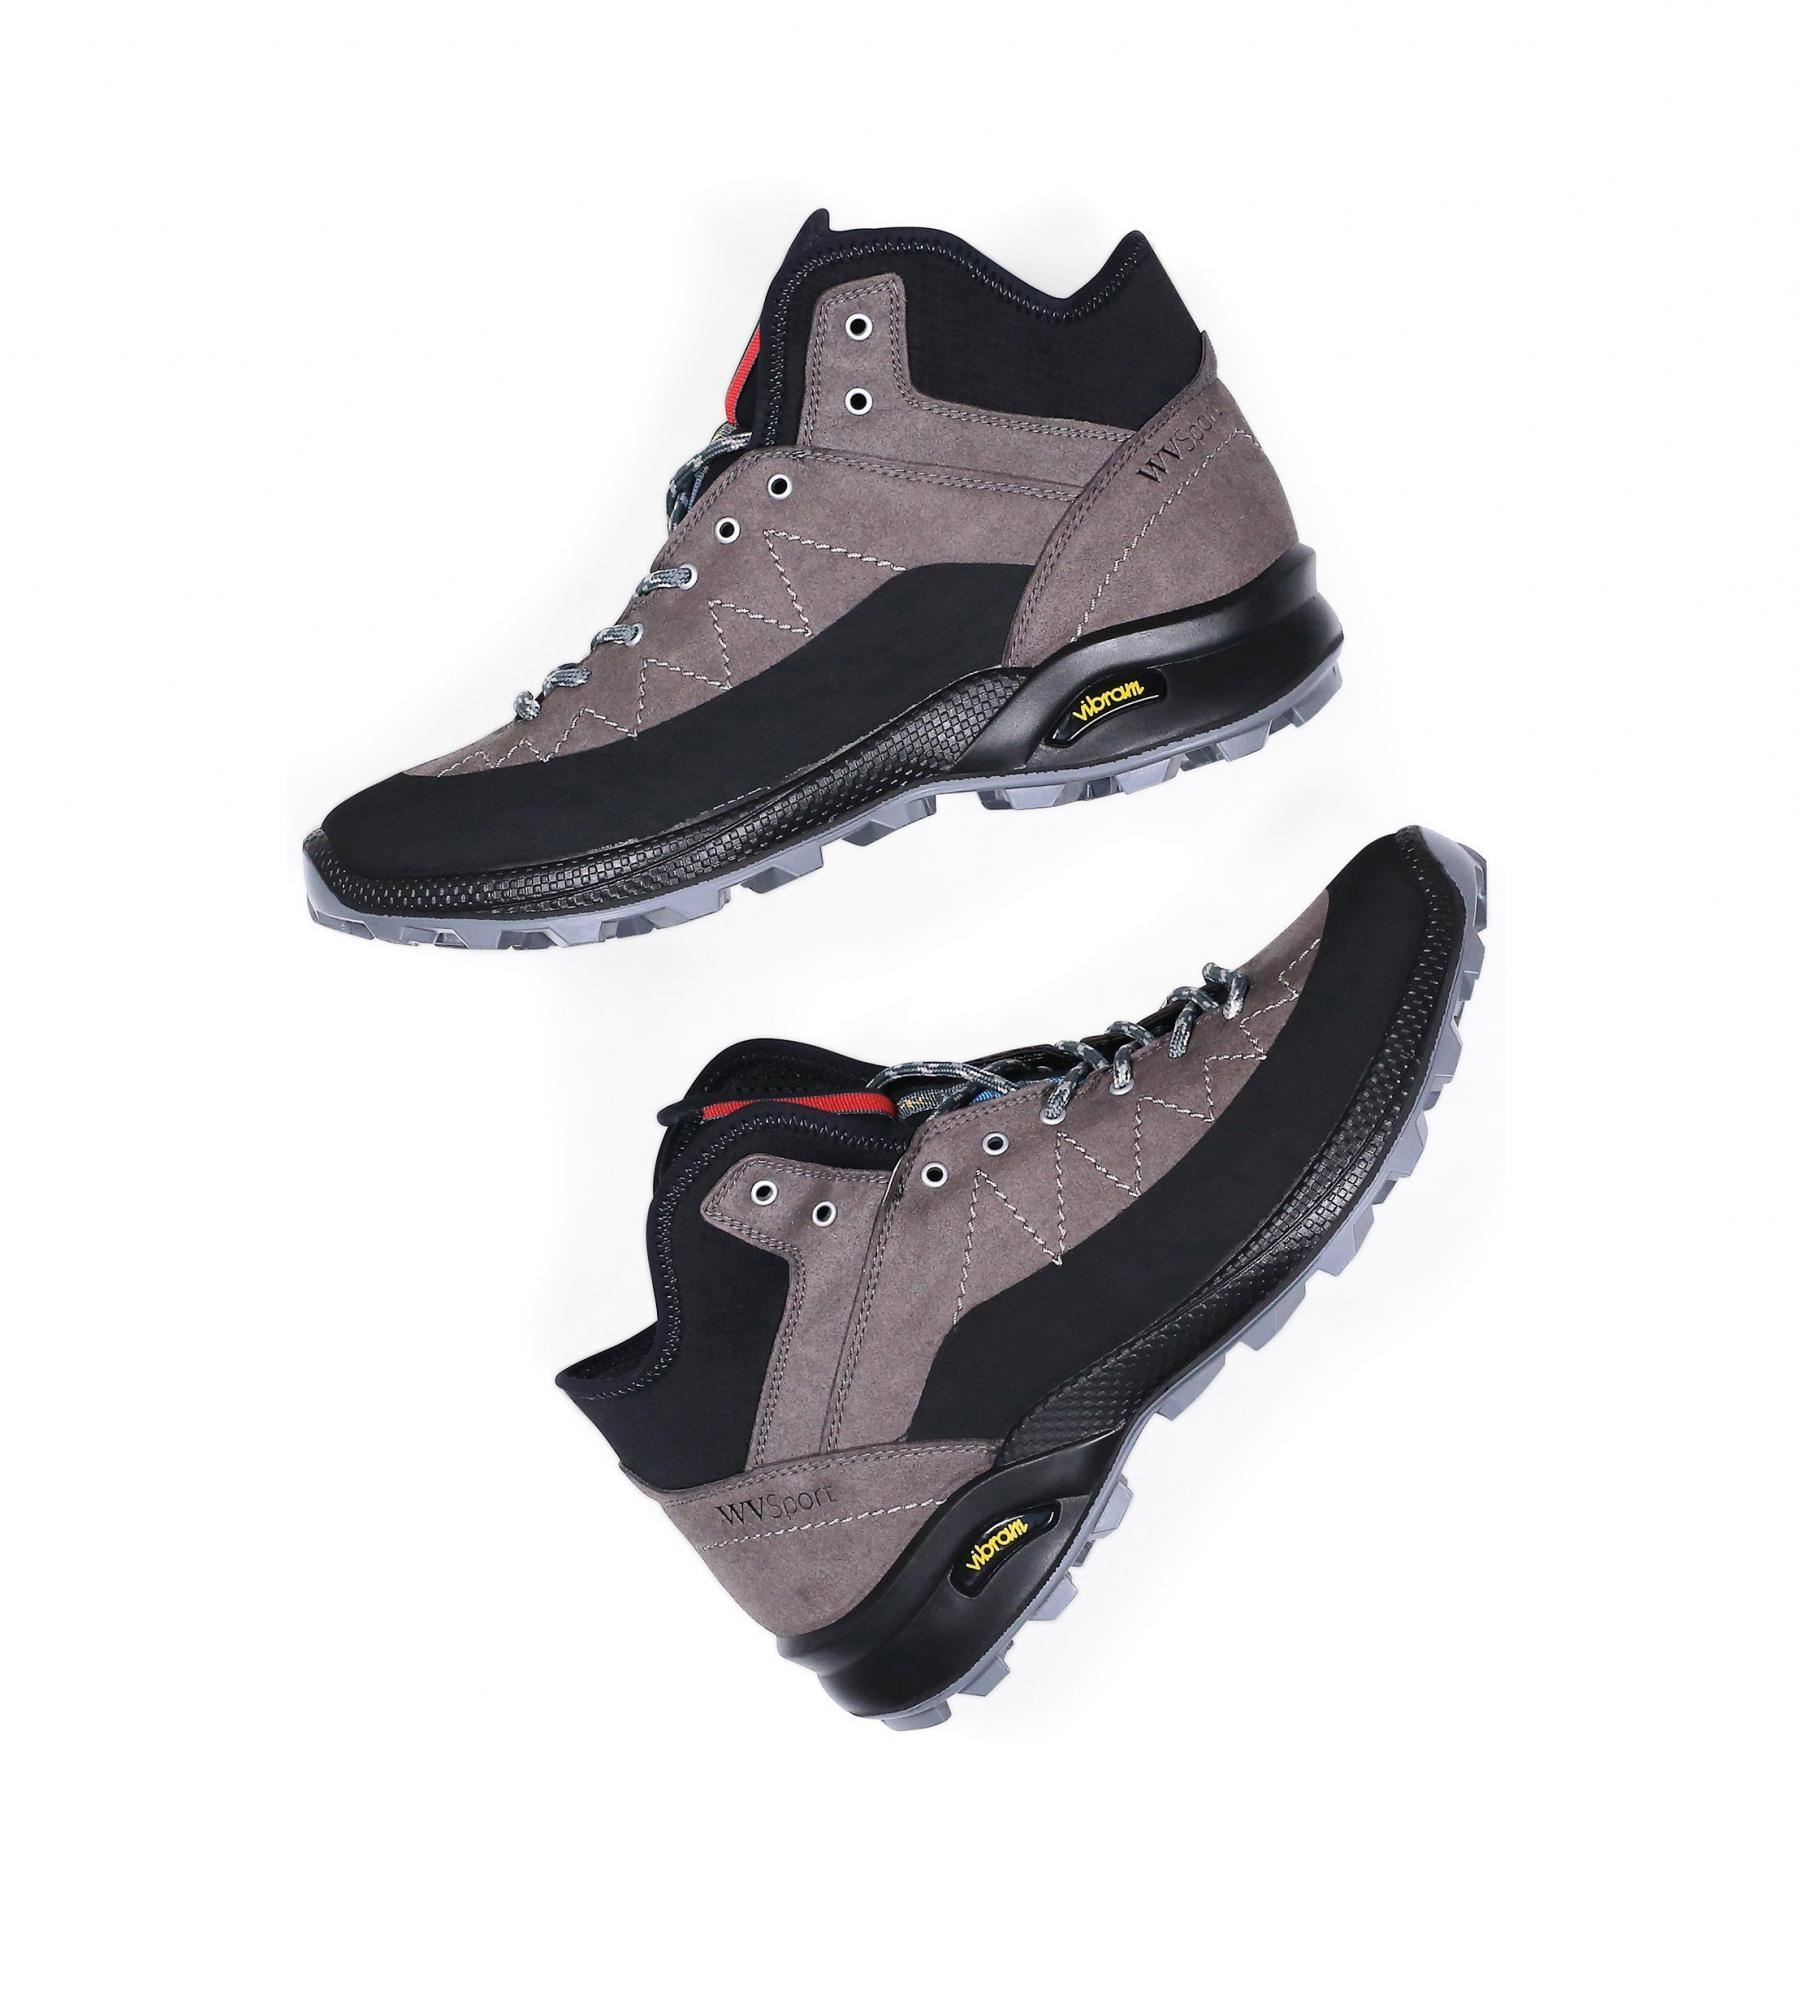 Scarpe Sportive Impermeabili Hiking Lacci Will's Boots Cross Uomo dQrshCtx